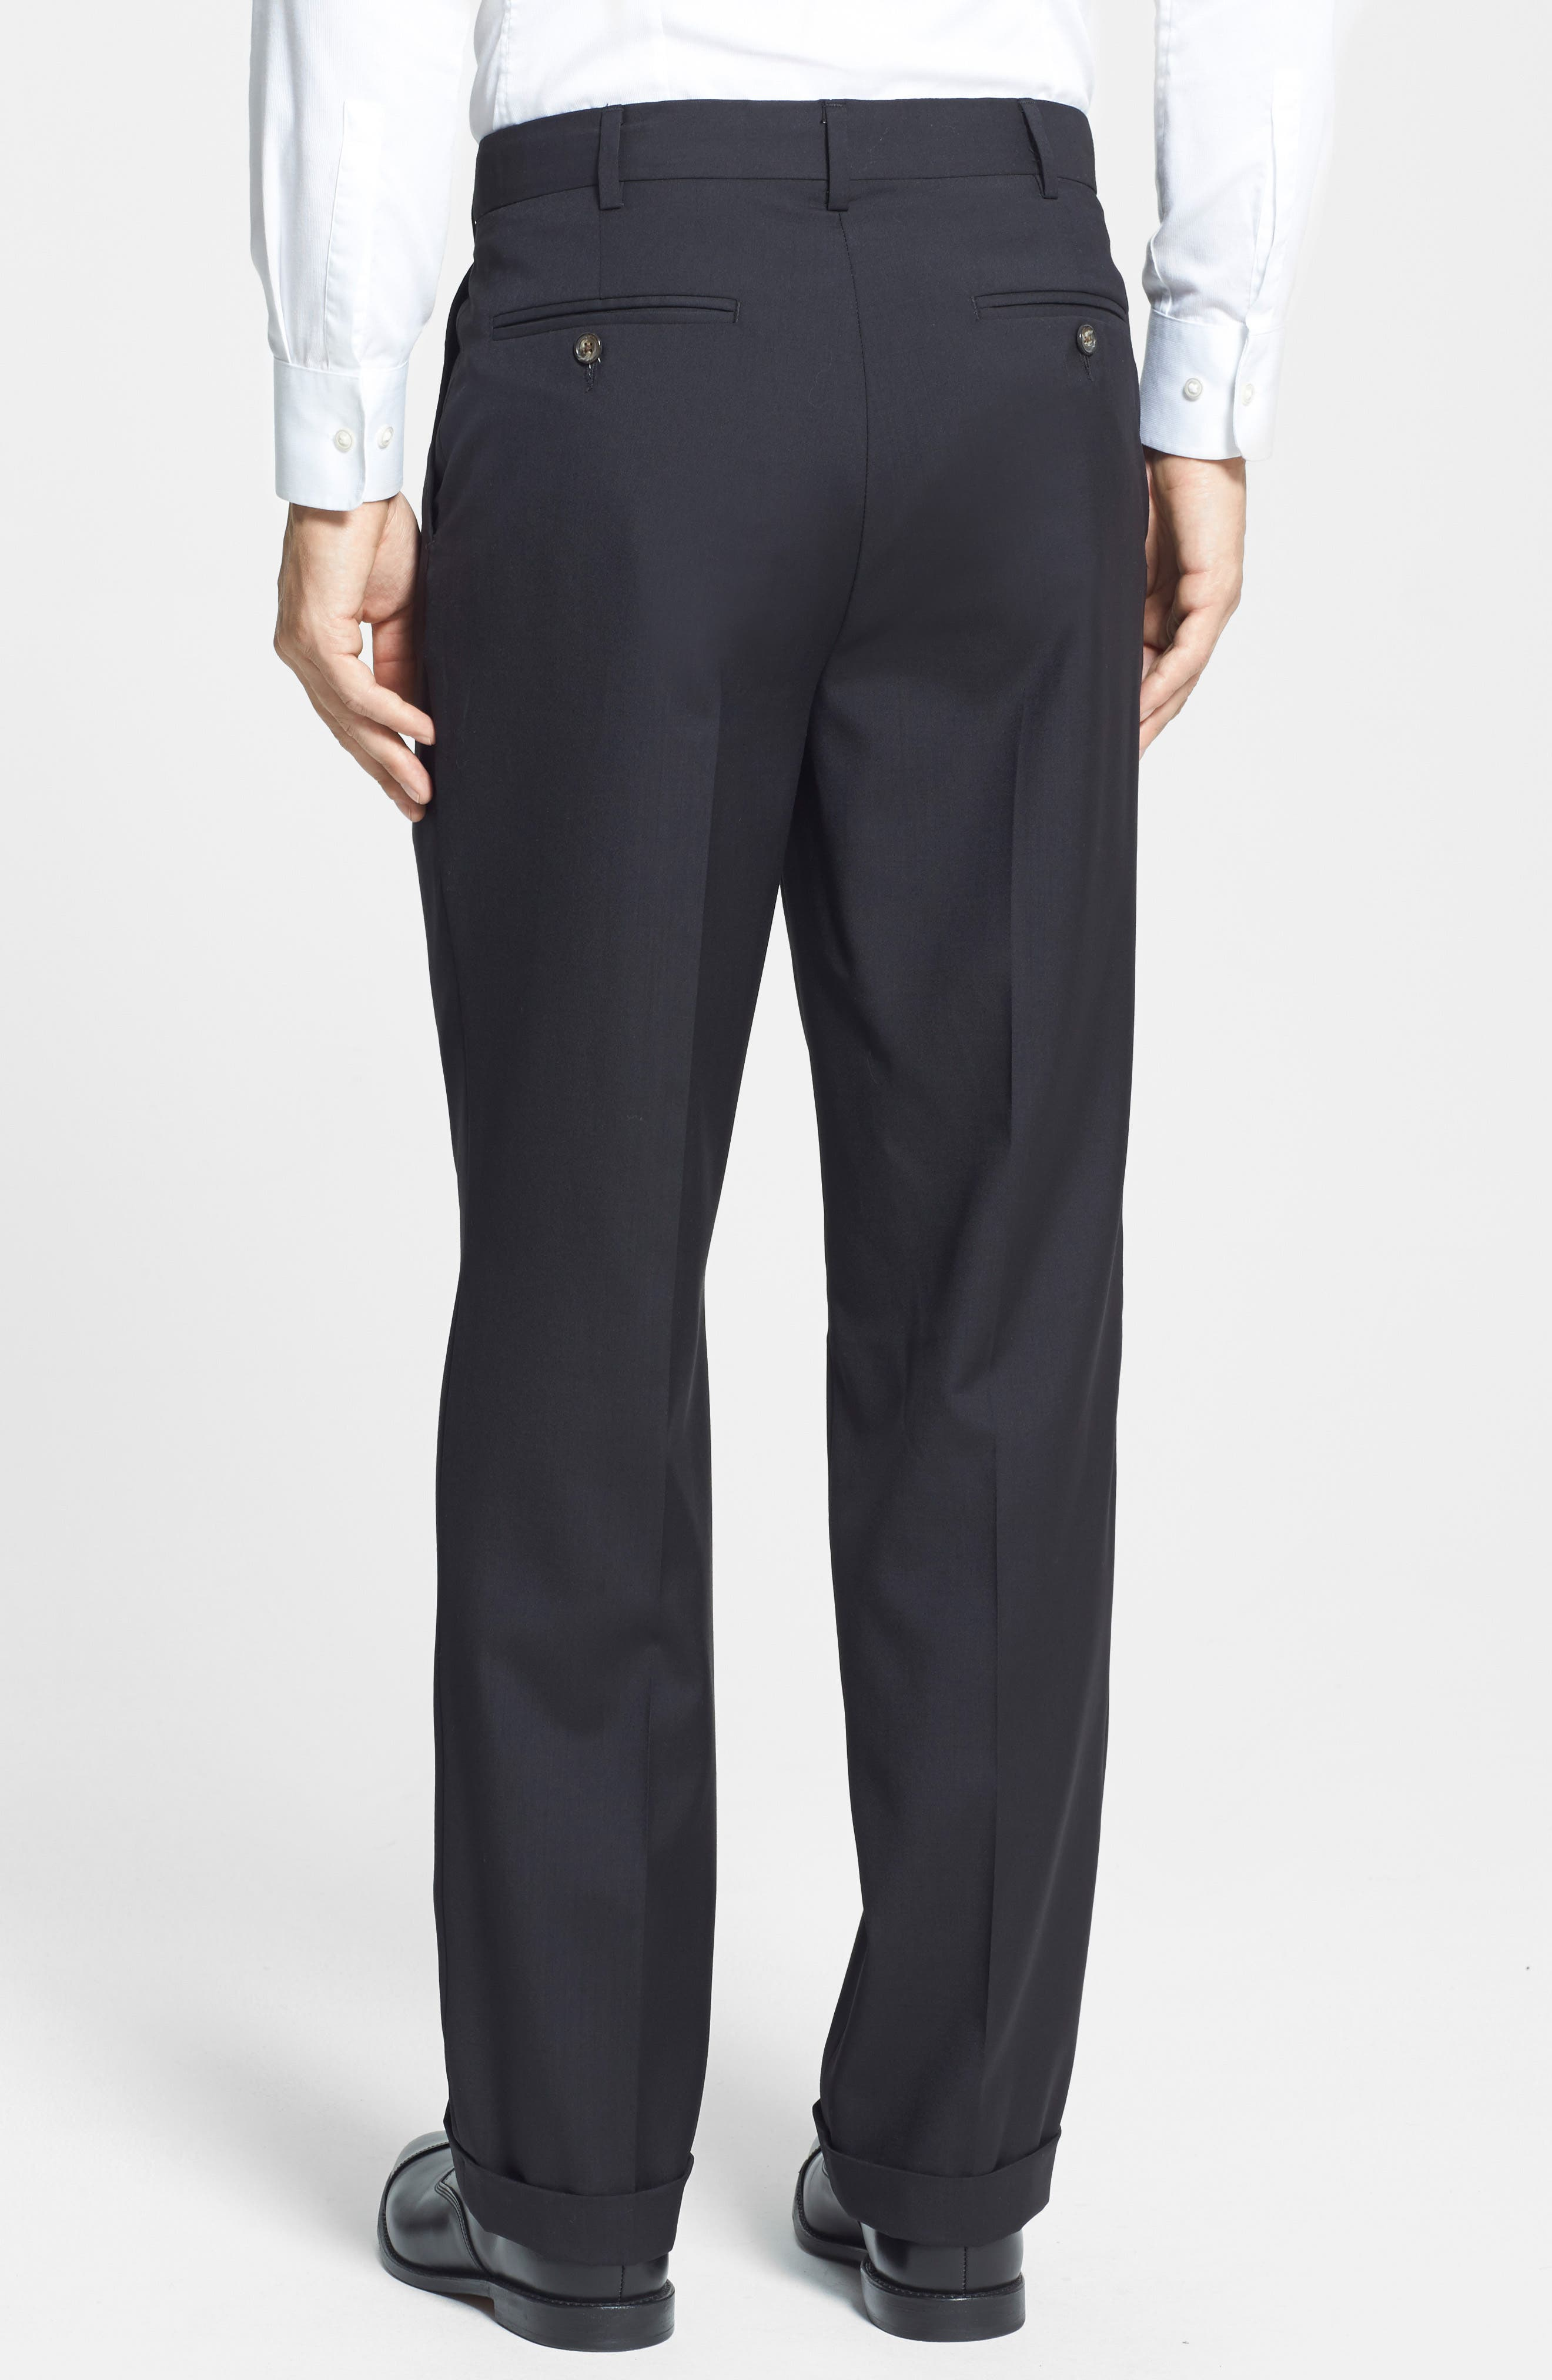 BERLE, Self Sizer Waist Pleated Trousers, Alternate thumbnail 3, color, BLACK